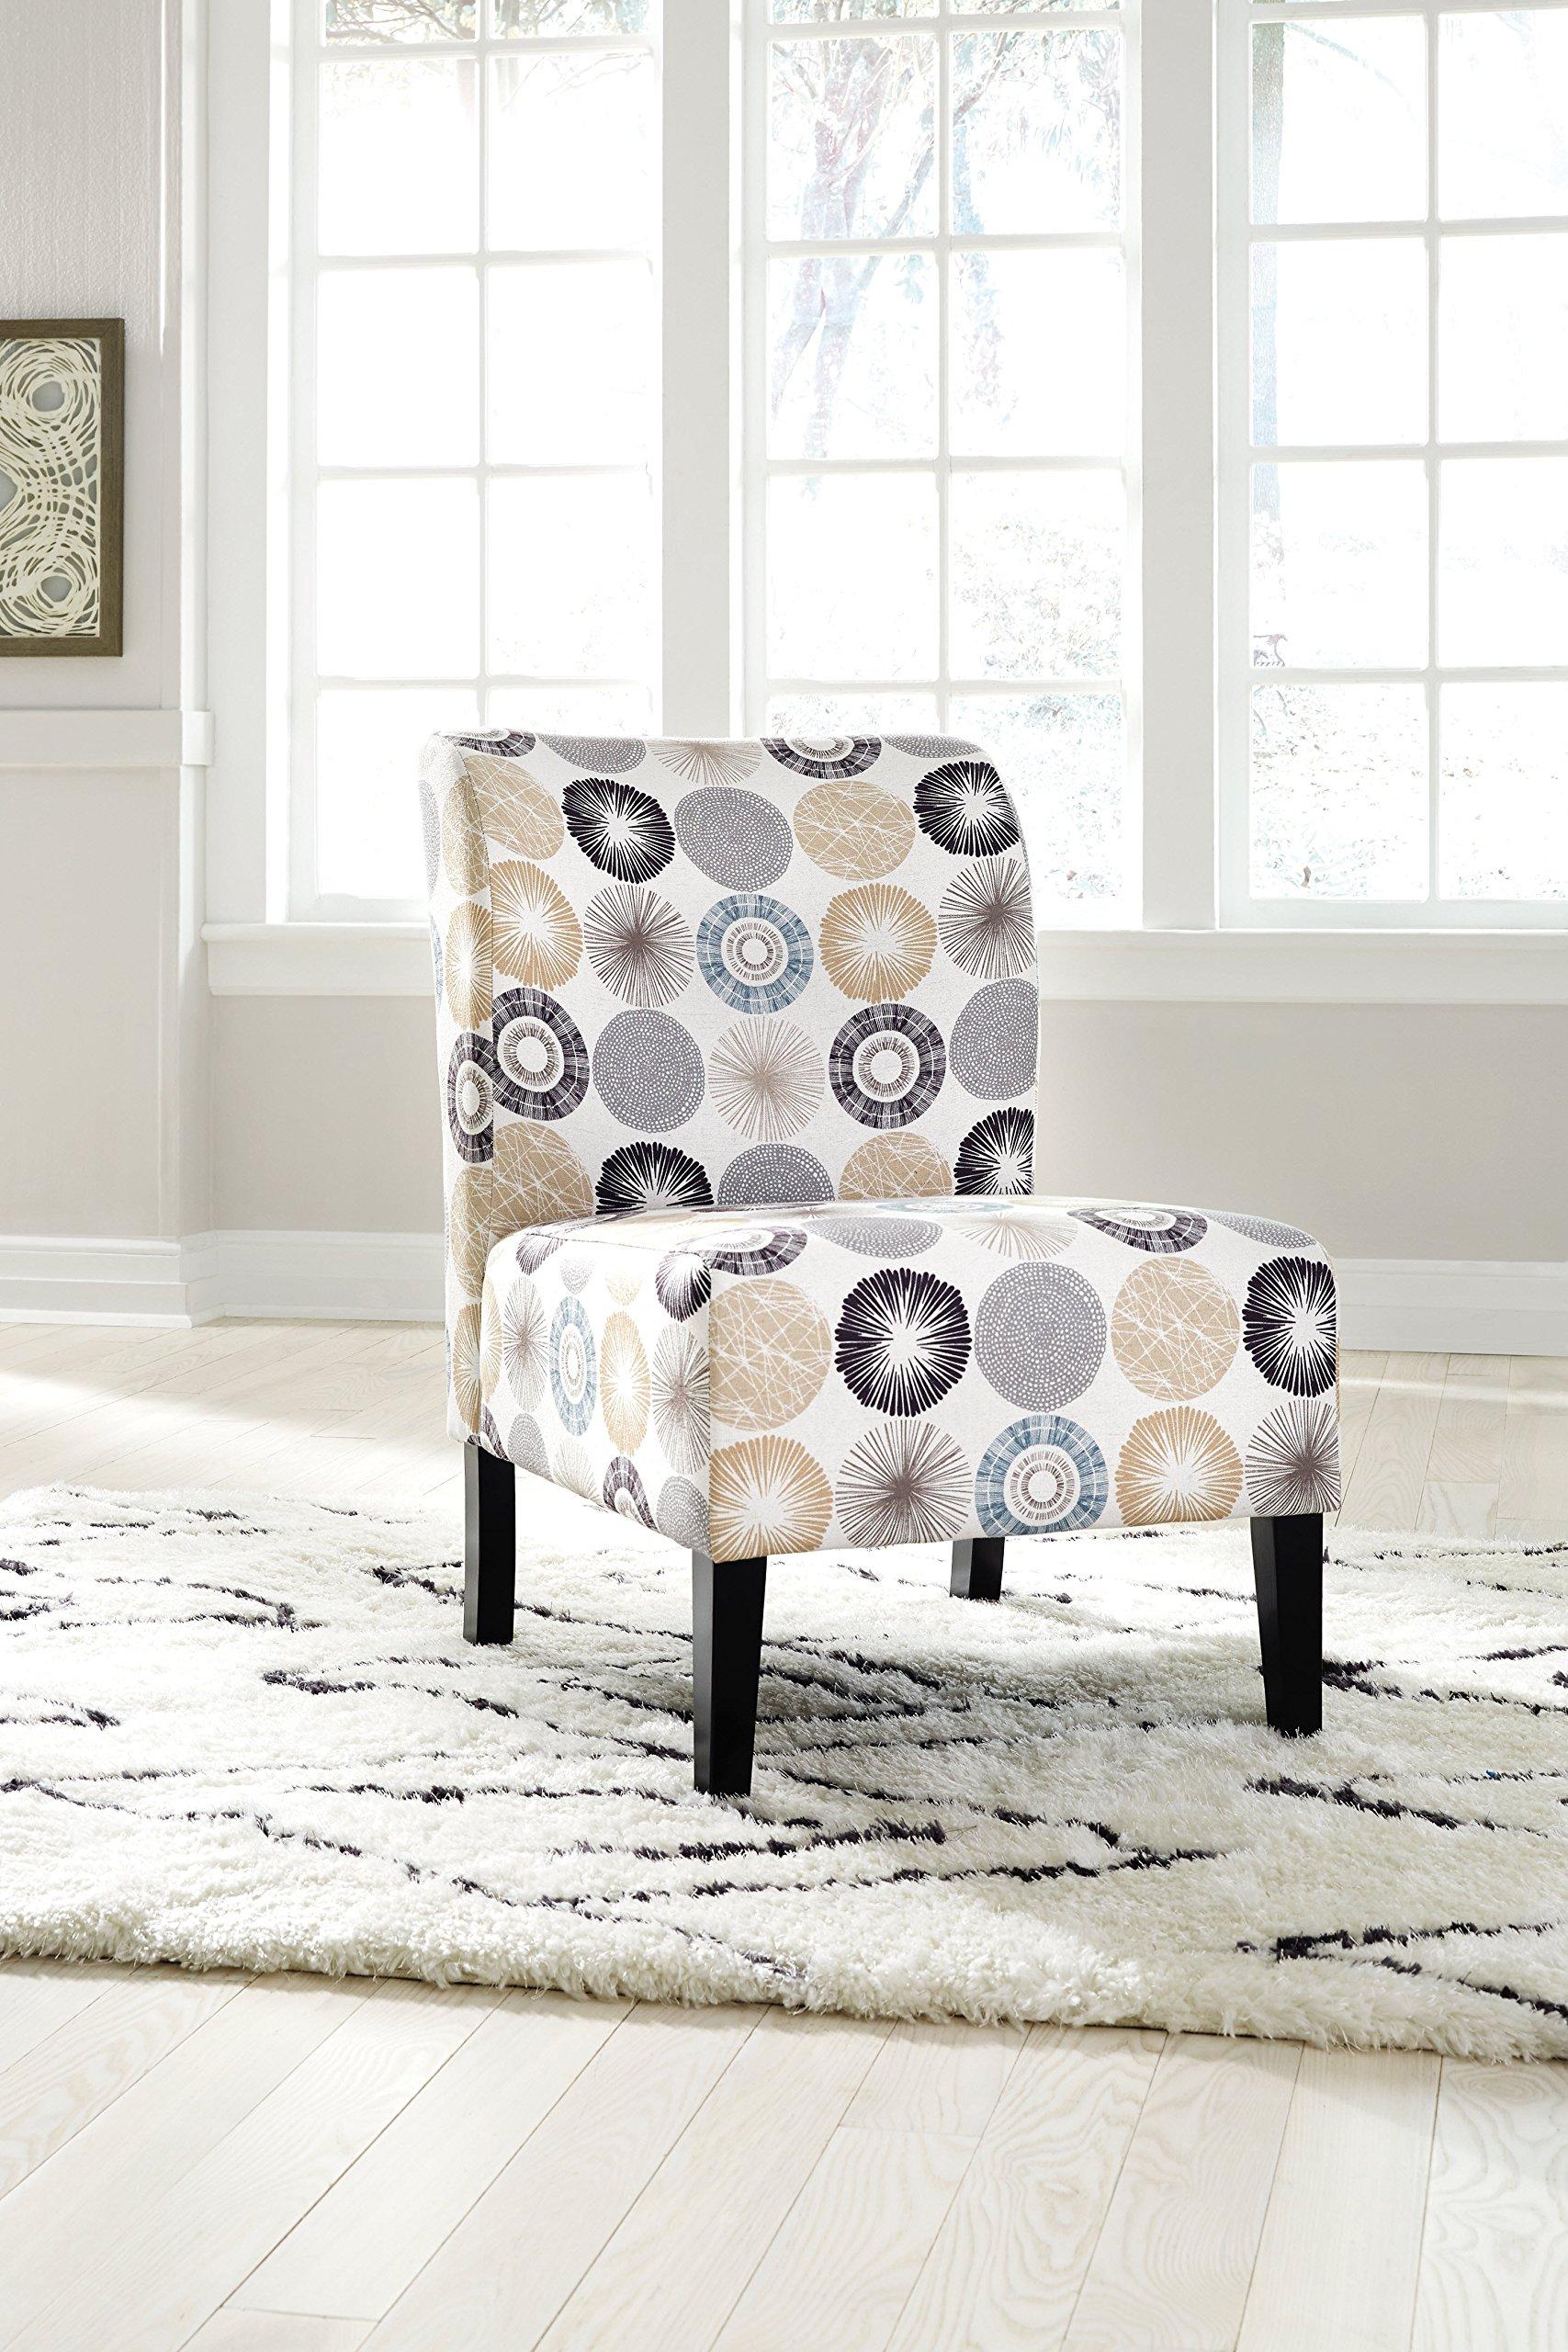 Ashley Furniture Signature Design - Triptis Accent Chair - Contemporary - Gray/Tan Geometric Design - Dark Brown Legs by Signature Design by Ashley (Image #2)